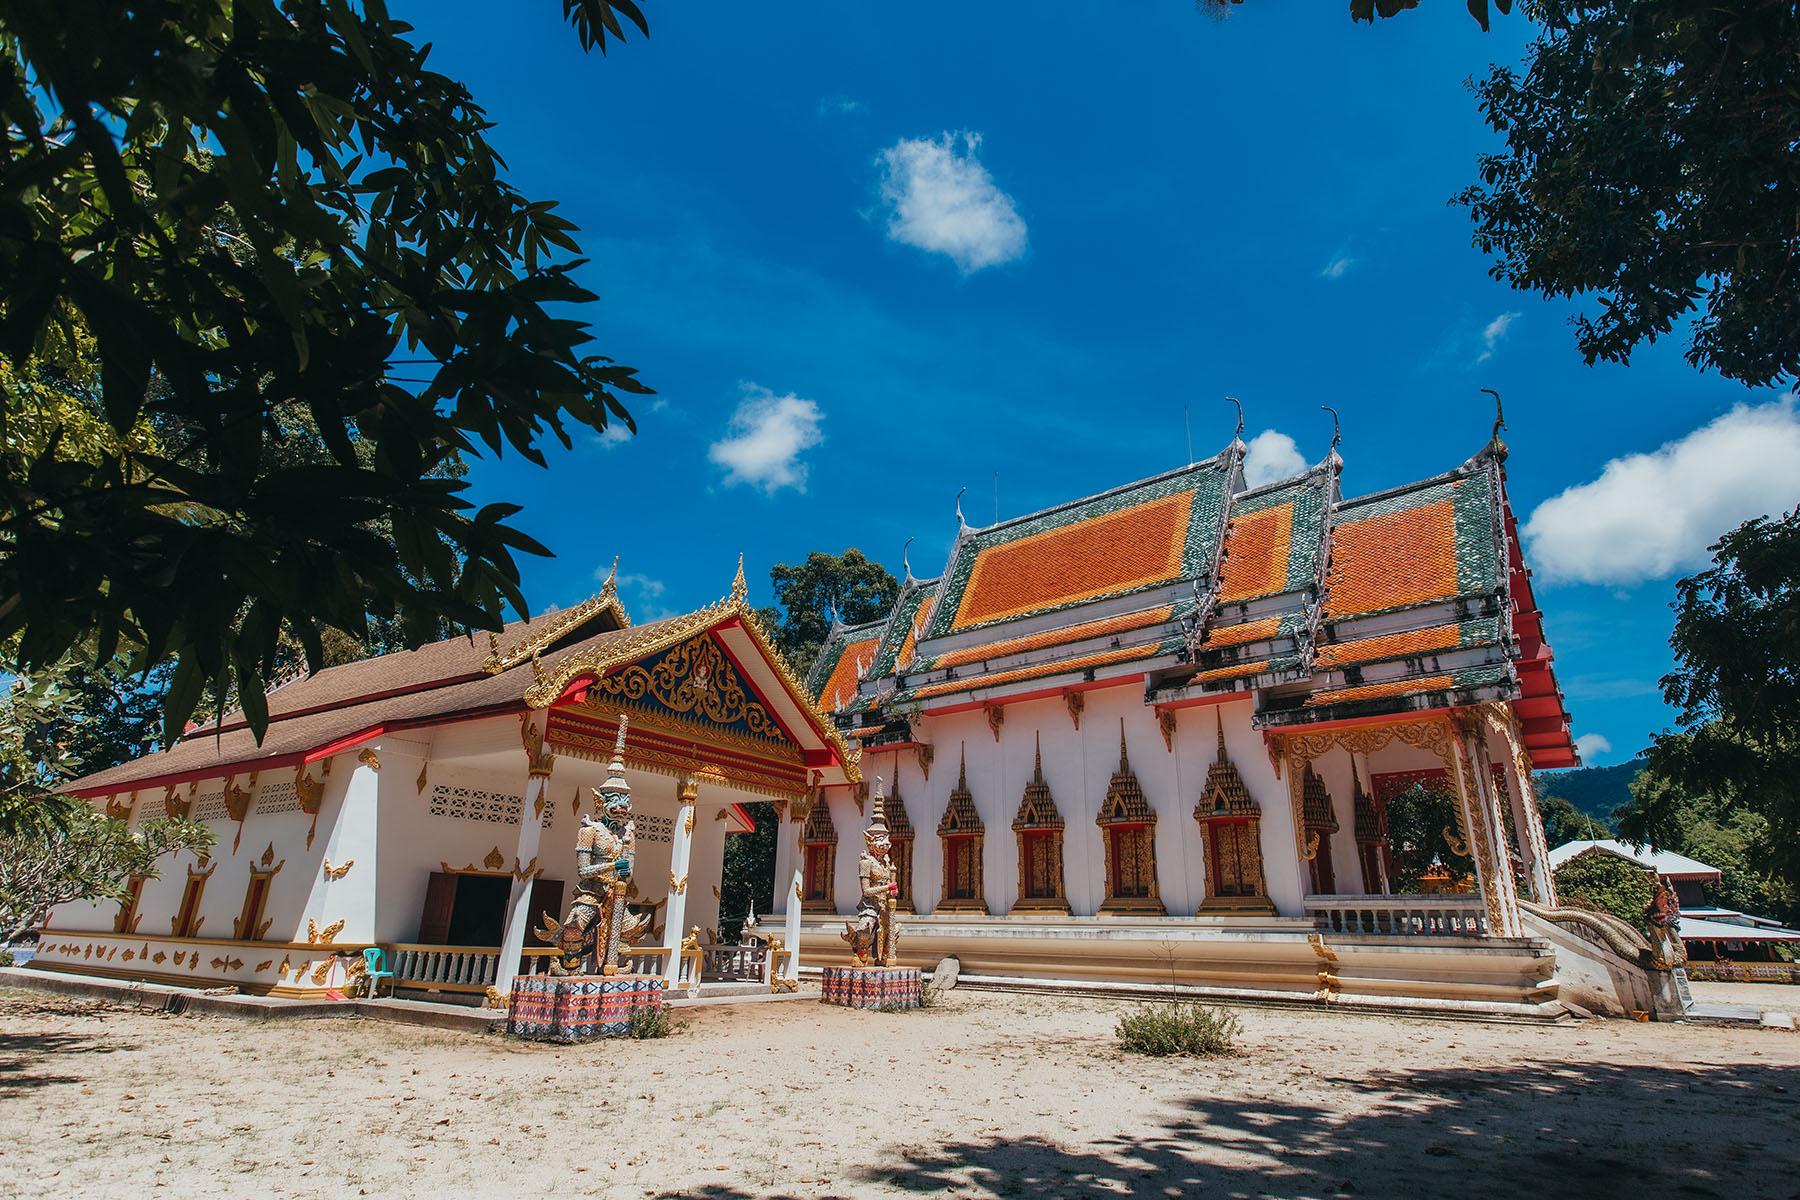 Wat Samret Koh Samui